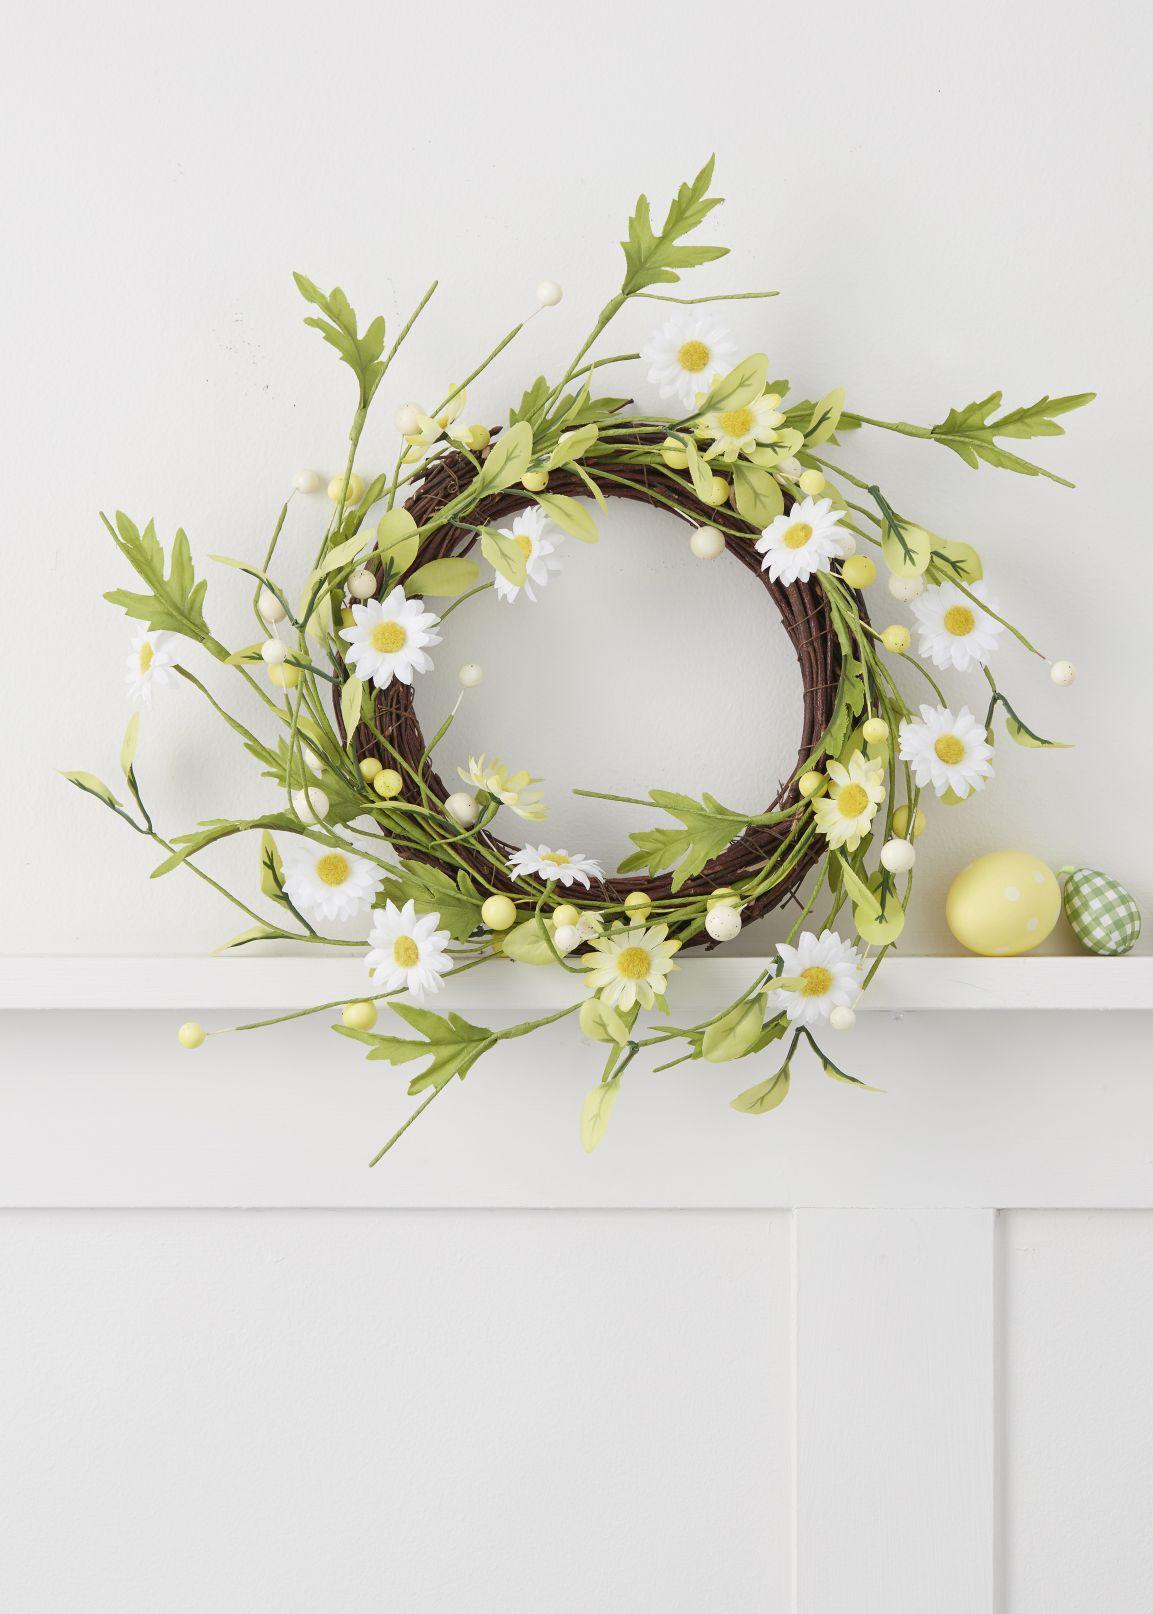 obr.9_the-contemporary-home_yellow-white-daisy-wreath-al30.00.jpg